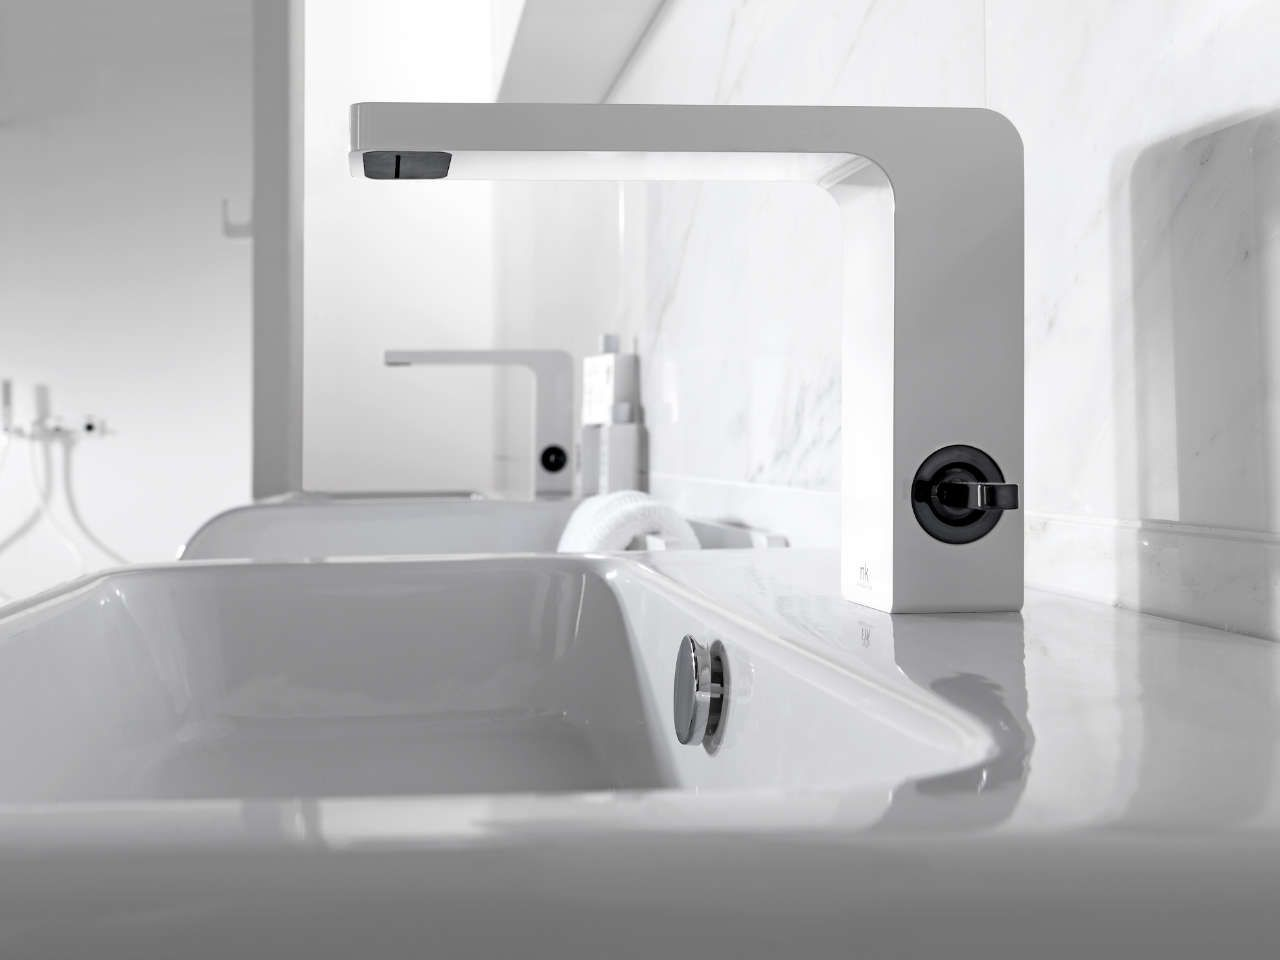 Basin mixer Lounge Cromo   Water Taps   Pinterest   Bathroom taps ...